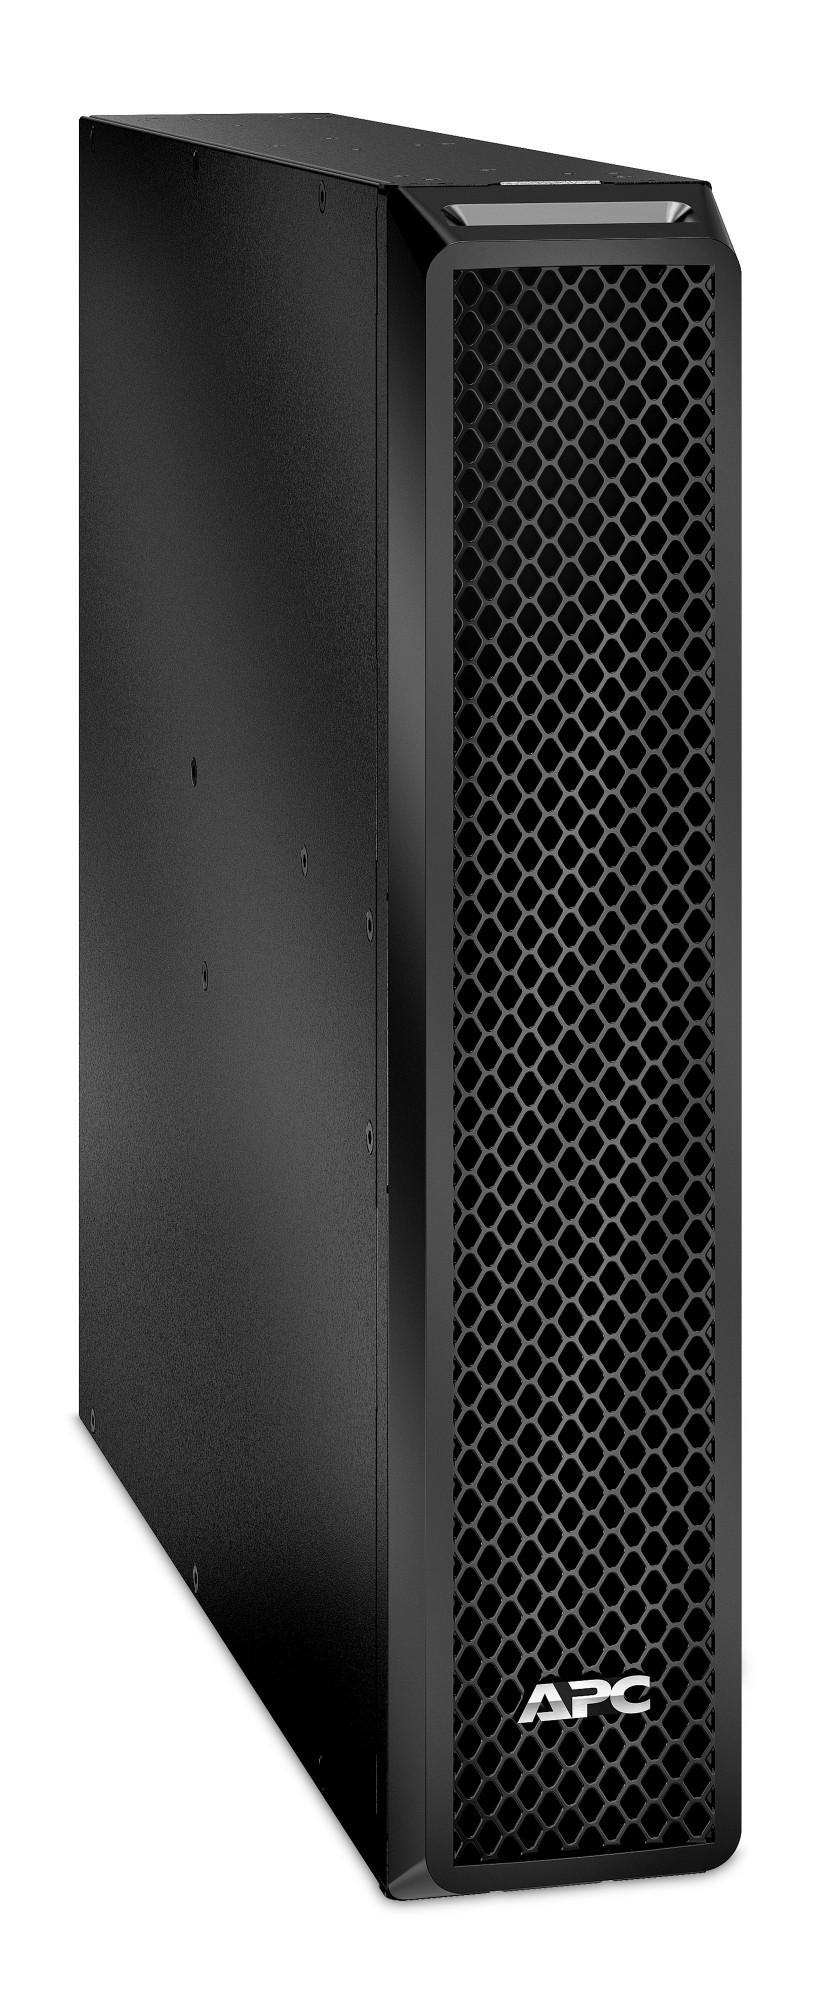 APC SRT48BP uninterruptible power supply (UPS) 1.5 kVA